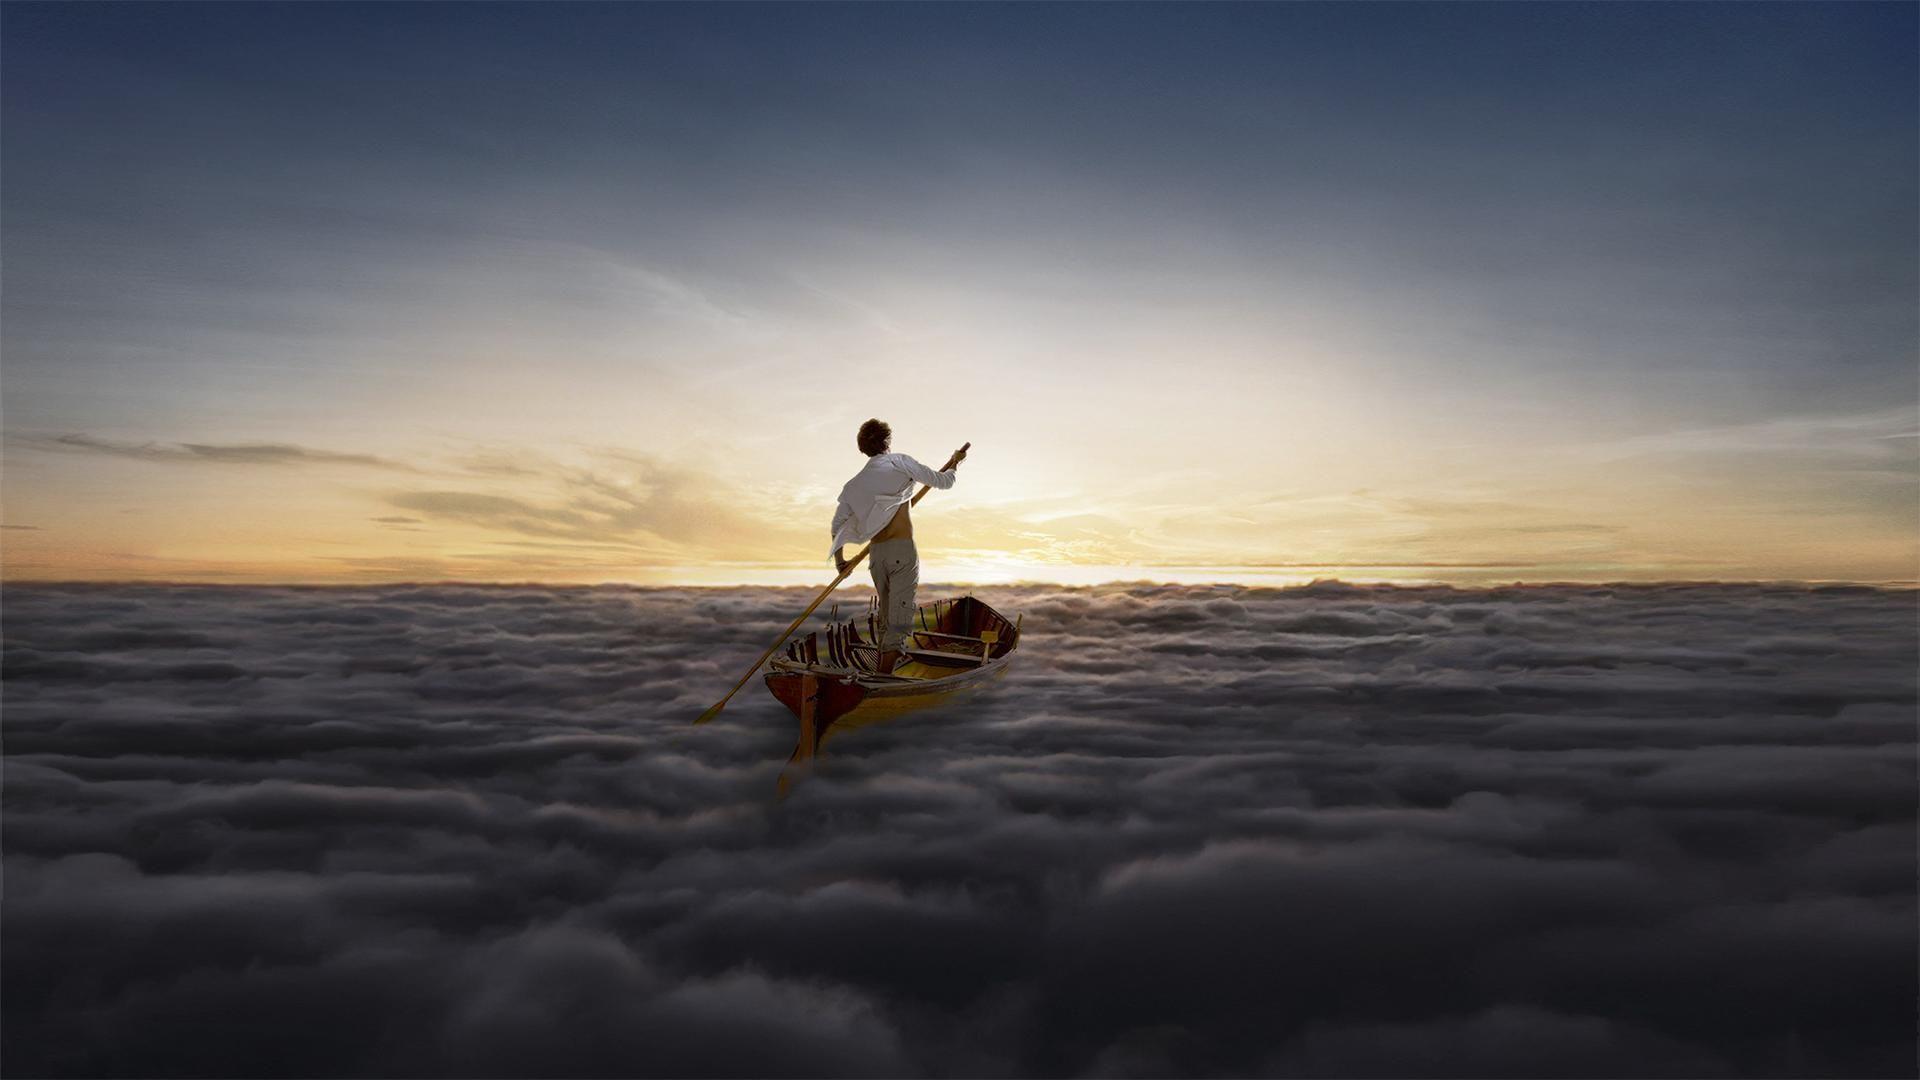 Music Pink Floyd The Endless River Rock Wallpaper Rock Never Dies